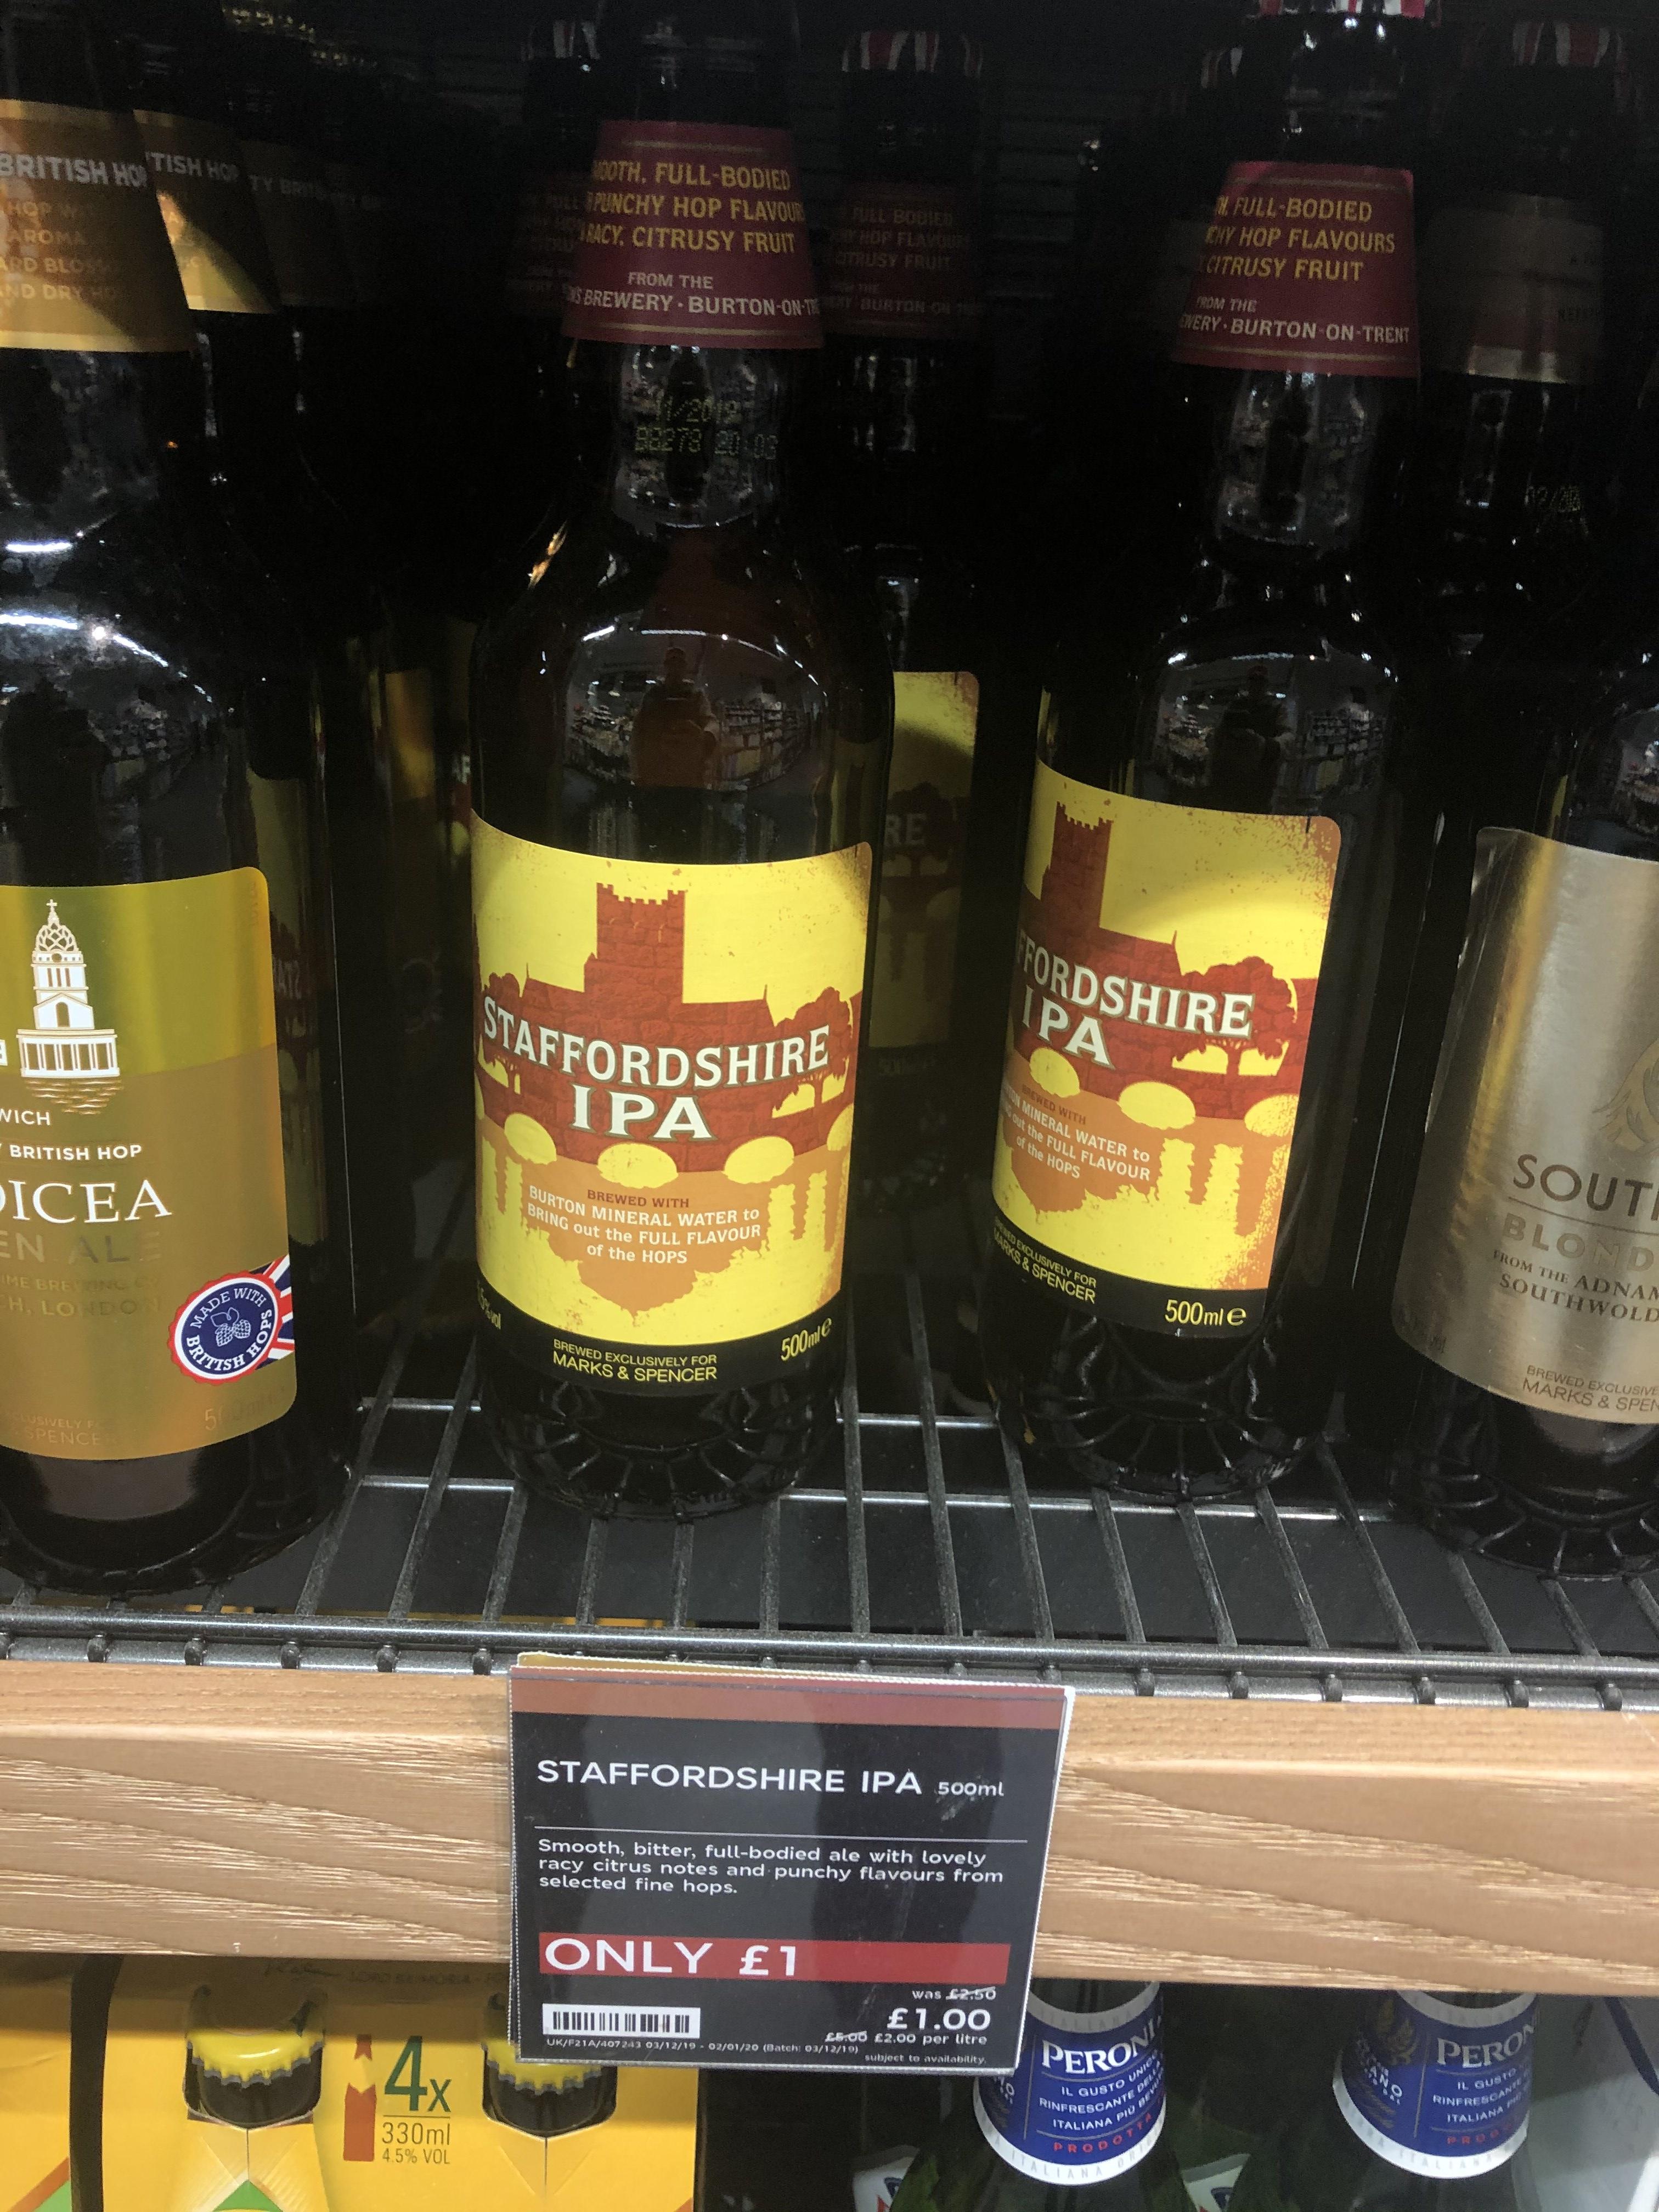 M&S Staffordshire IPA 500ml Bottle £1 @ Greenford M&S food hall.